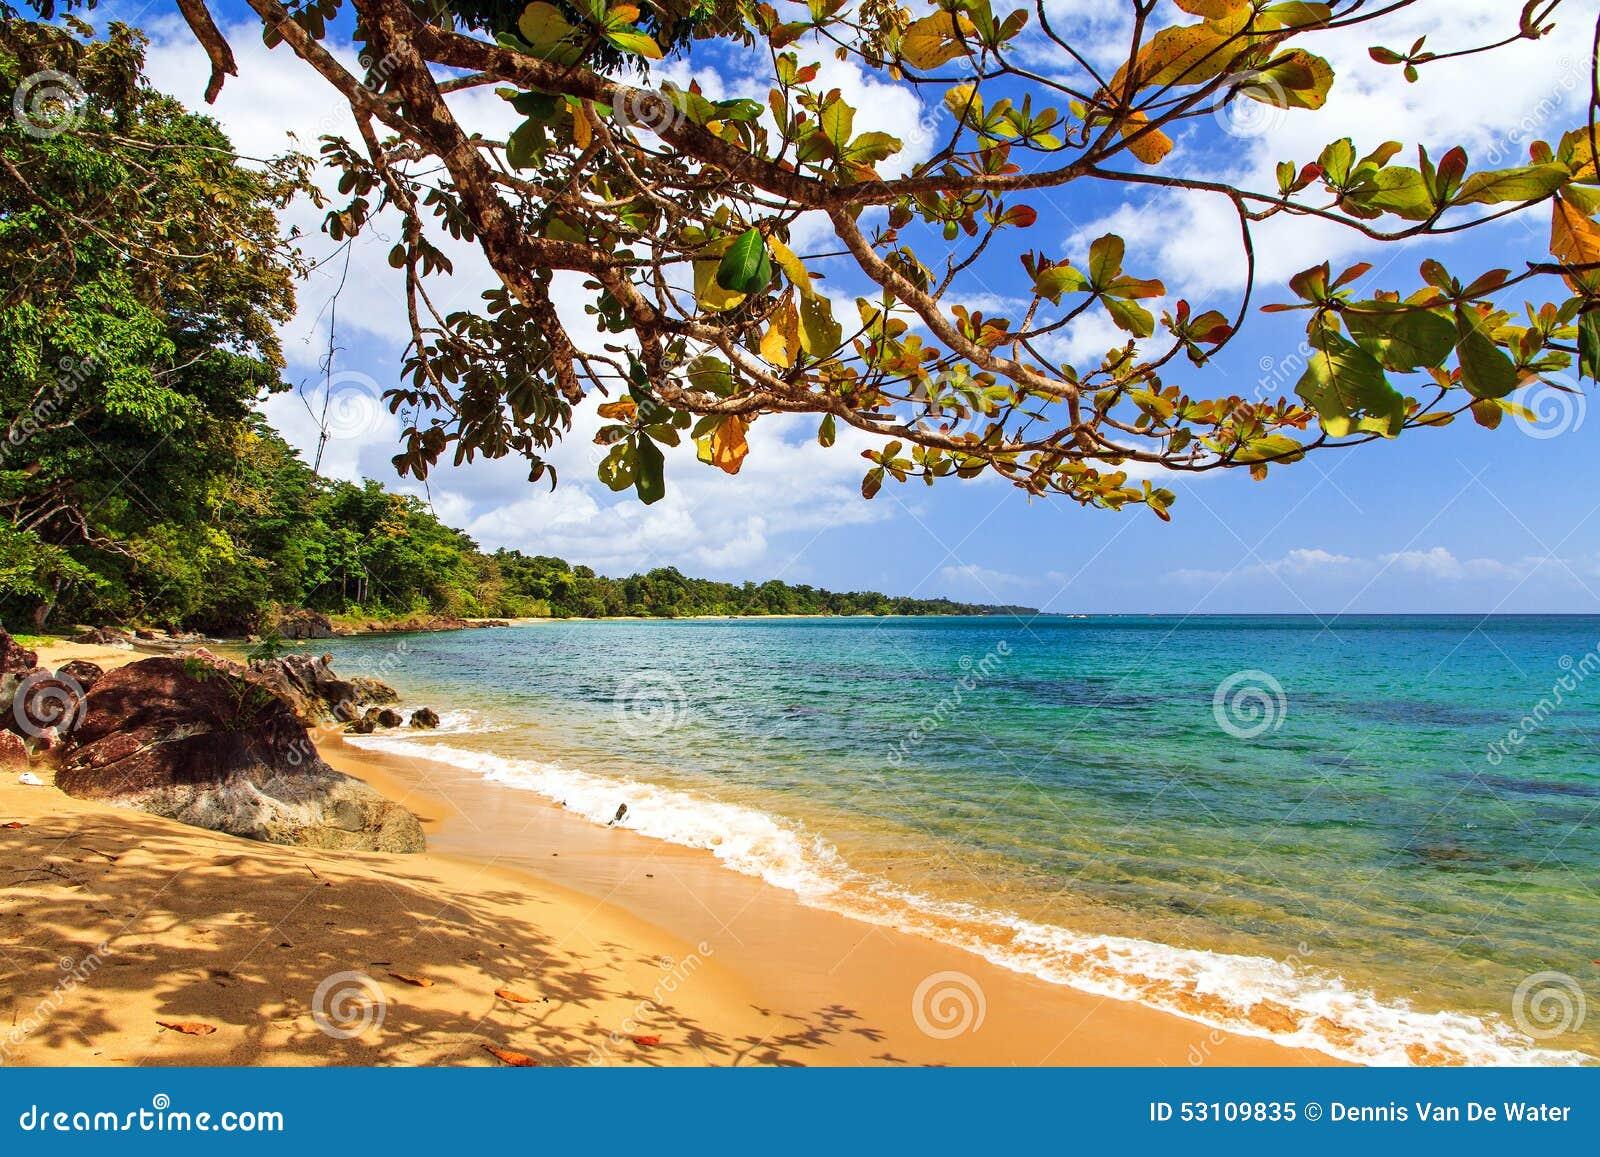 Masoala forest beach stock image Image of seascape